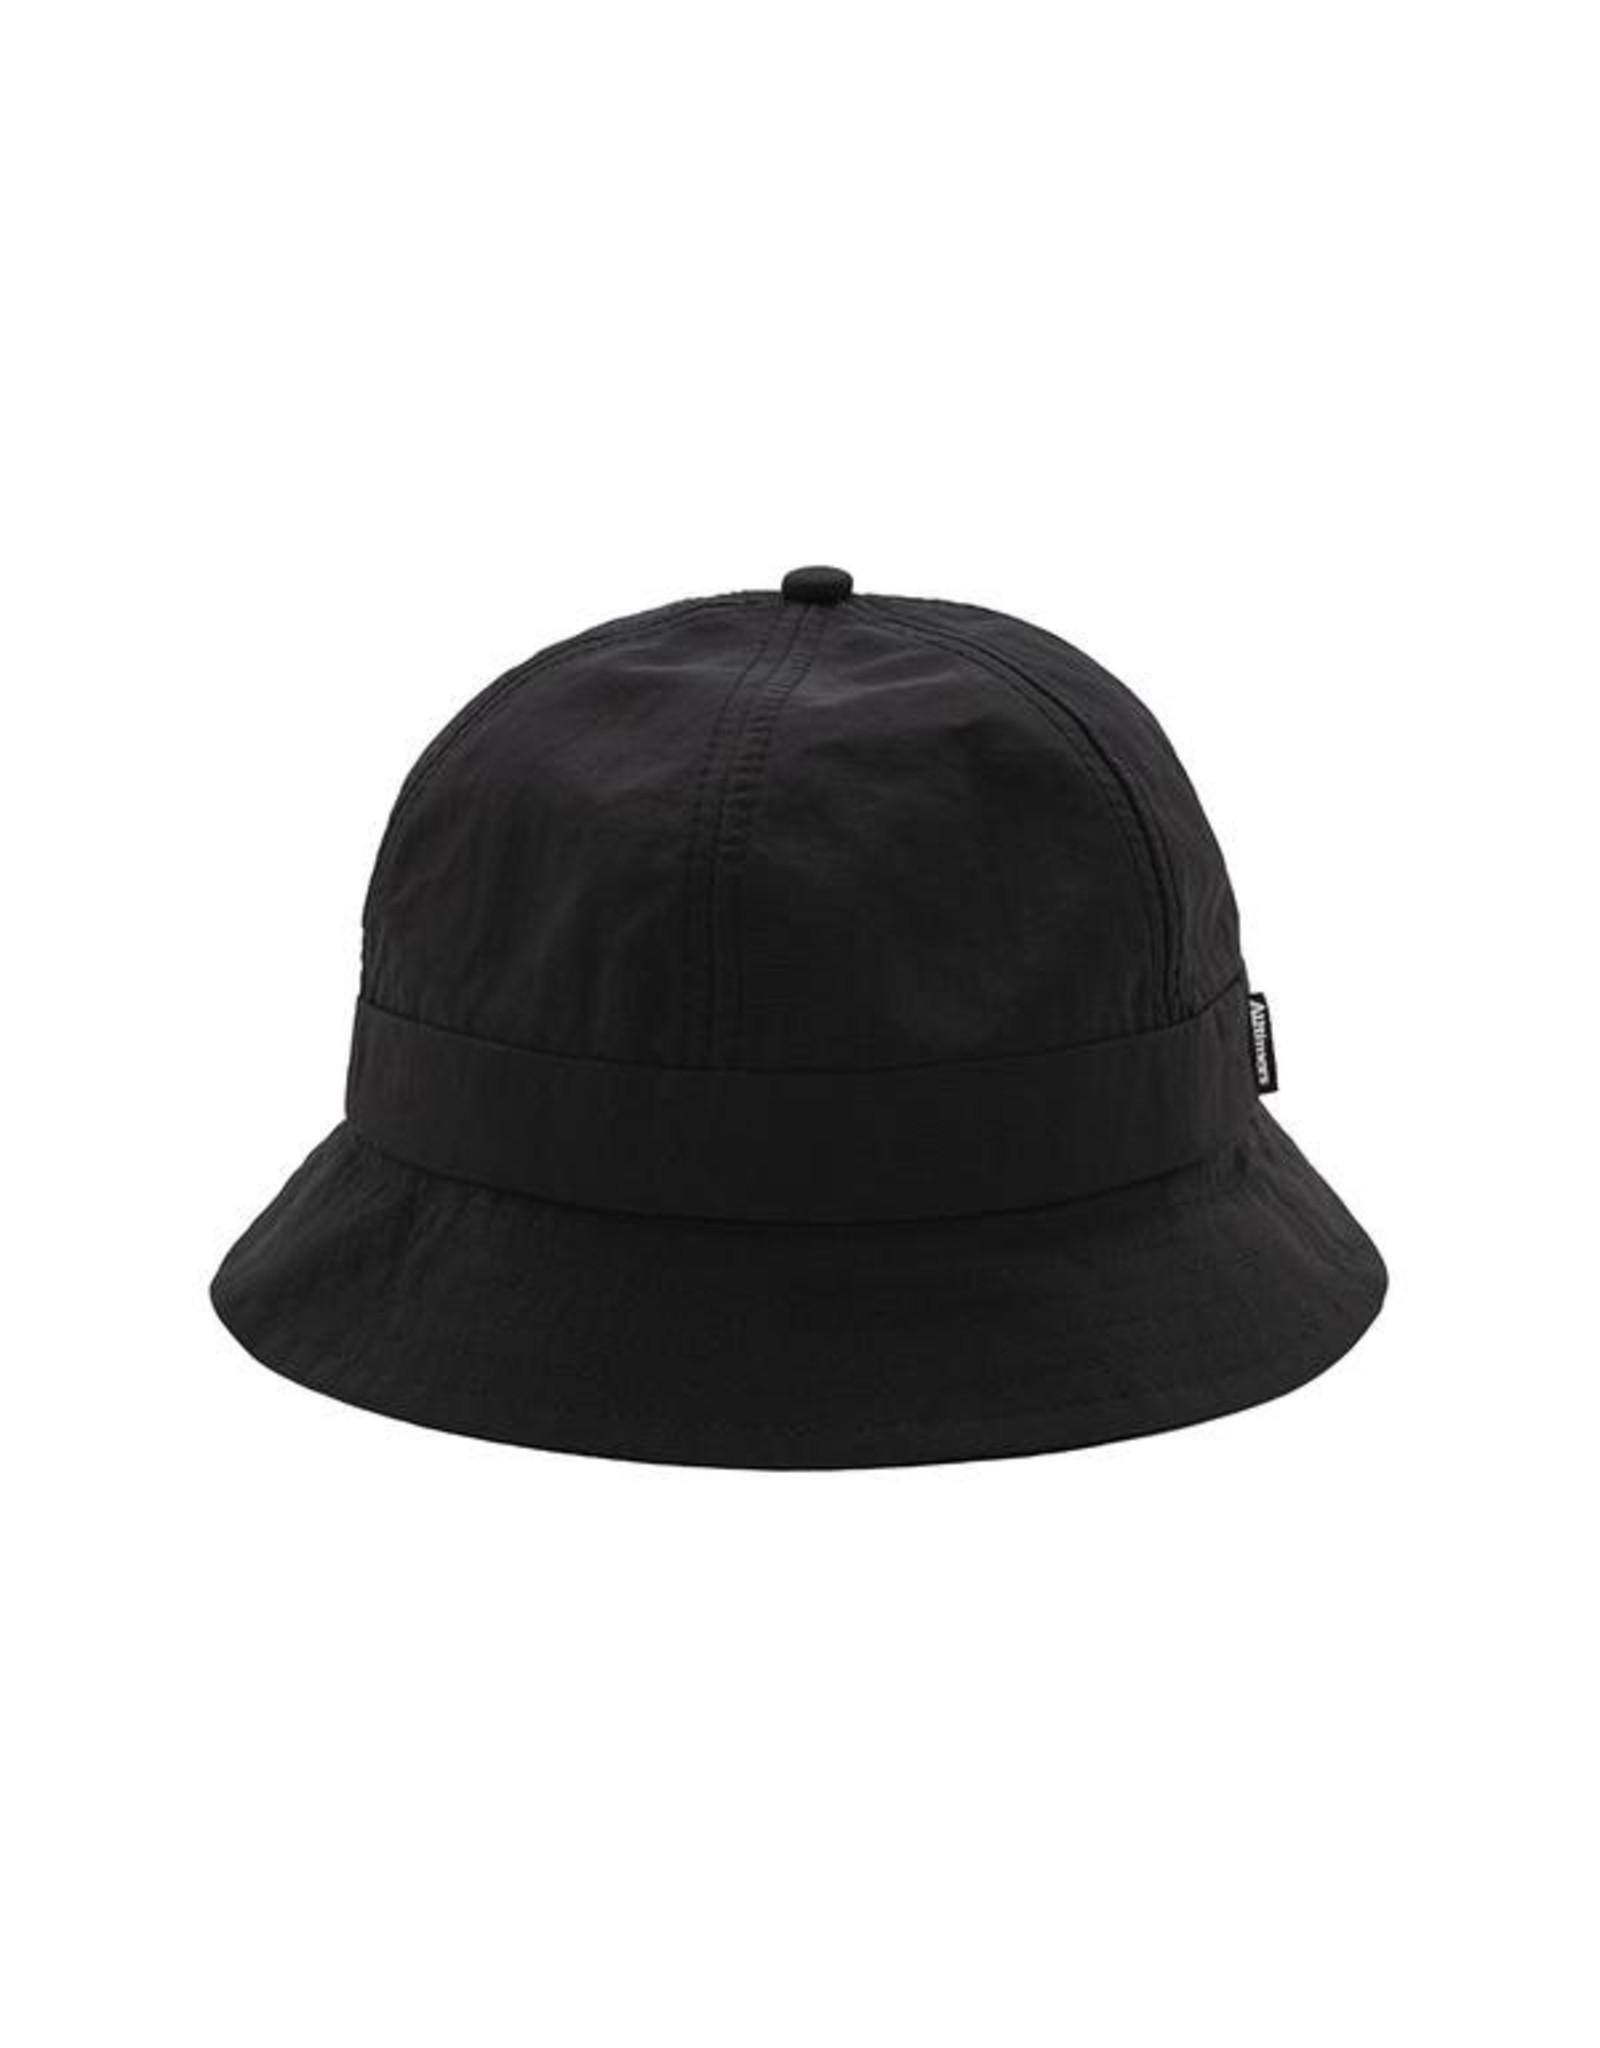 ALLTIMERS SKATEBOARD DECKS ALLTIMERS - BROADWAY BUCKET HAT - BLACK